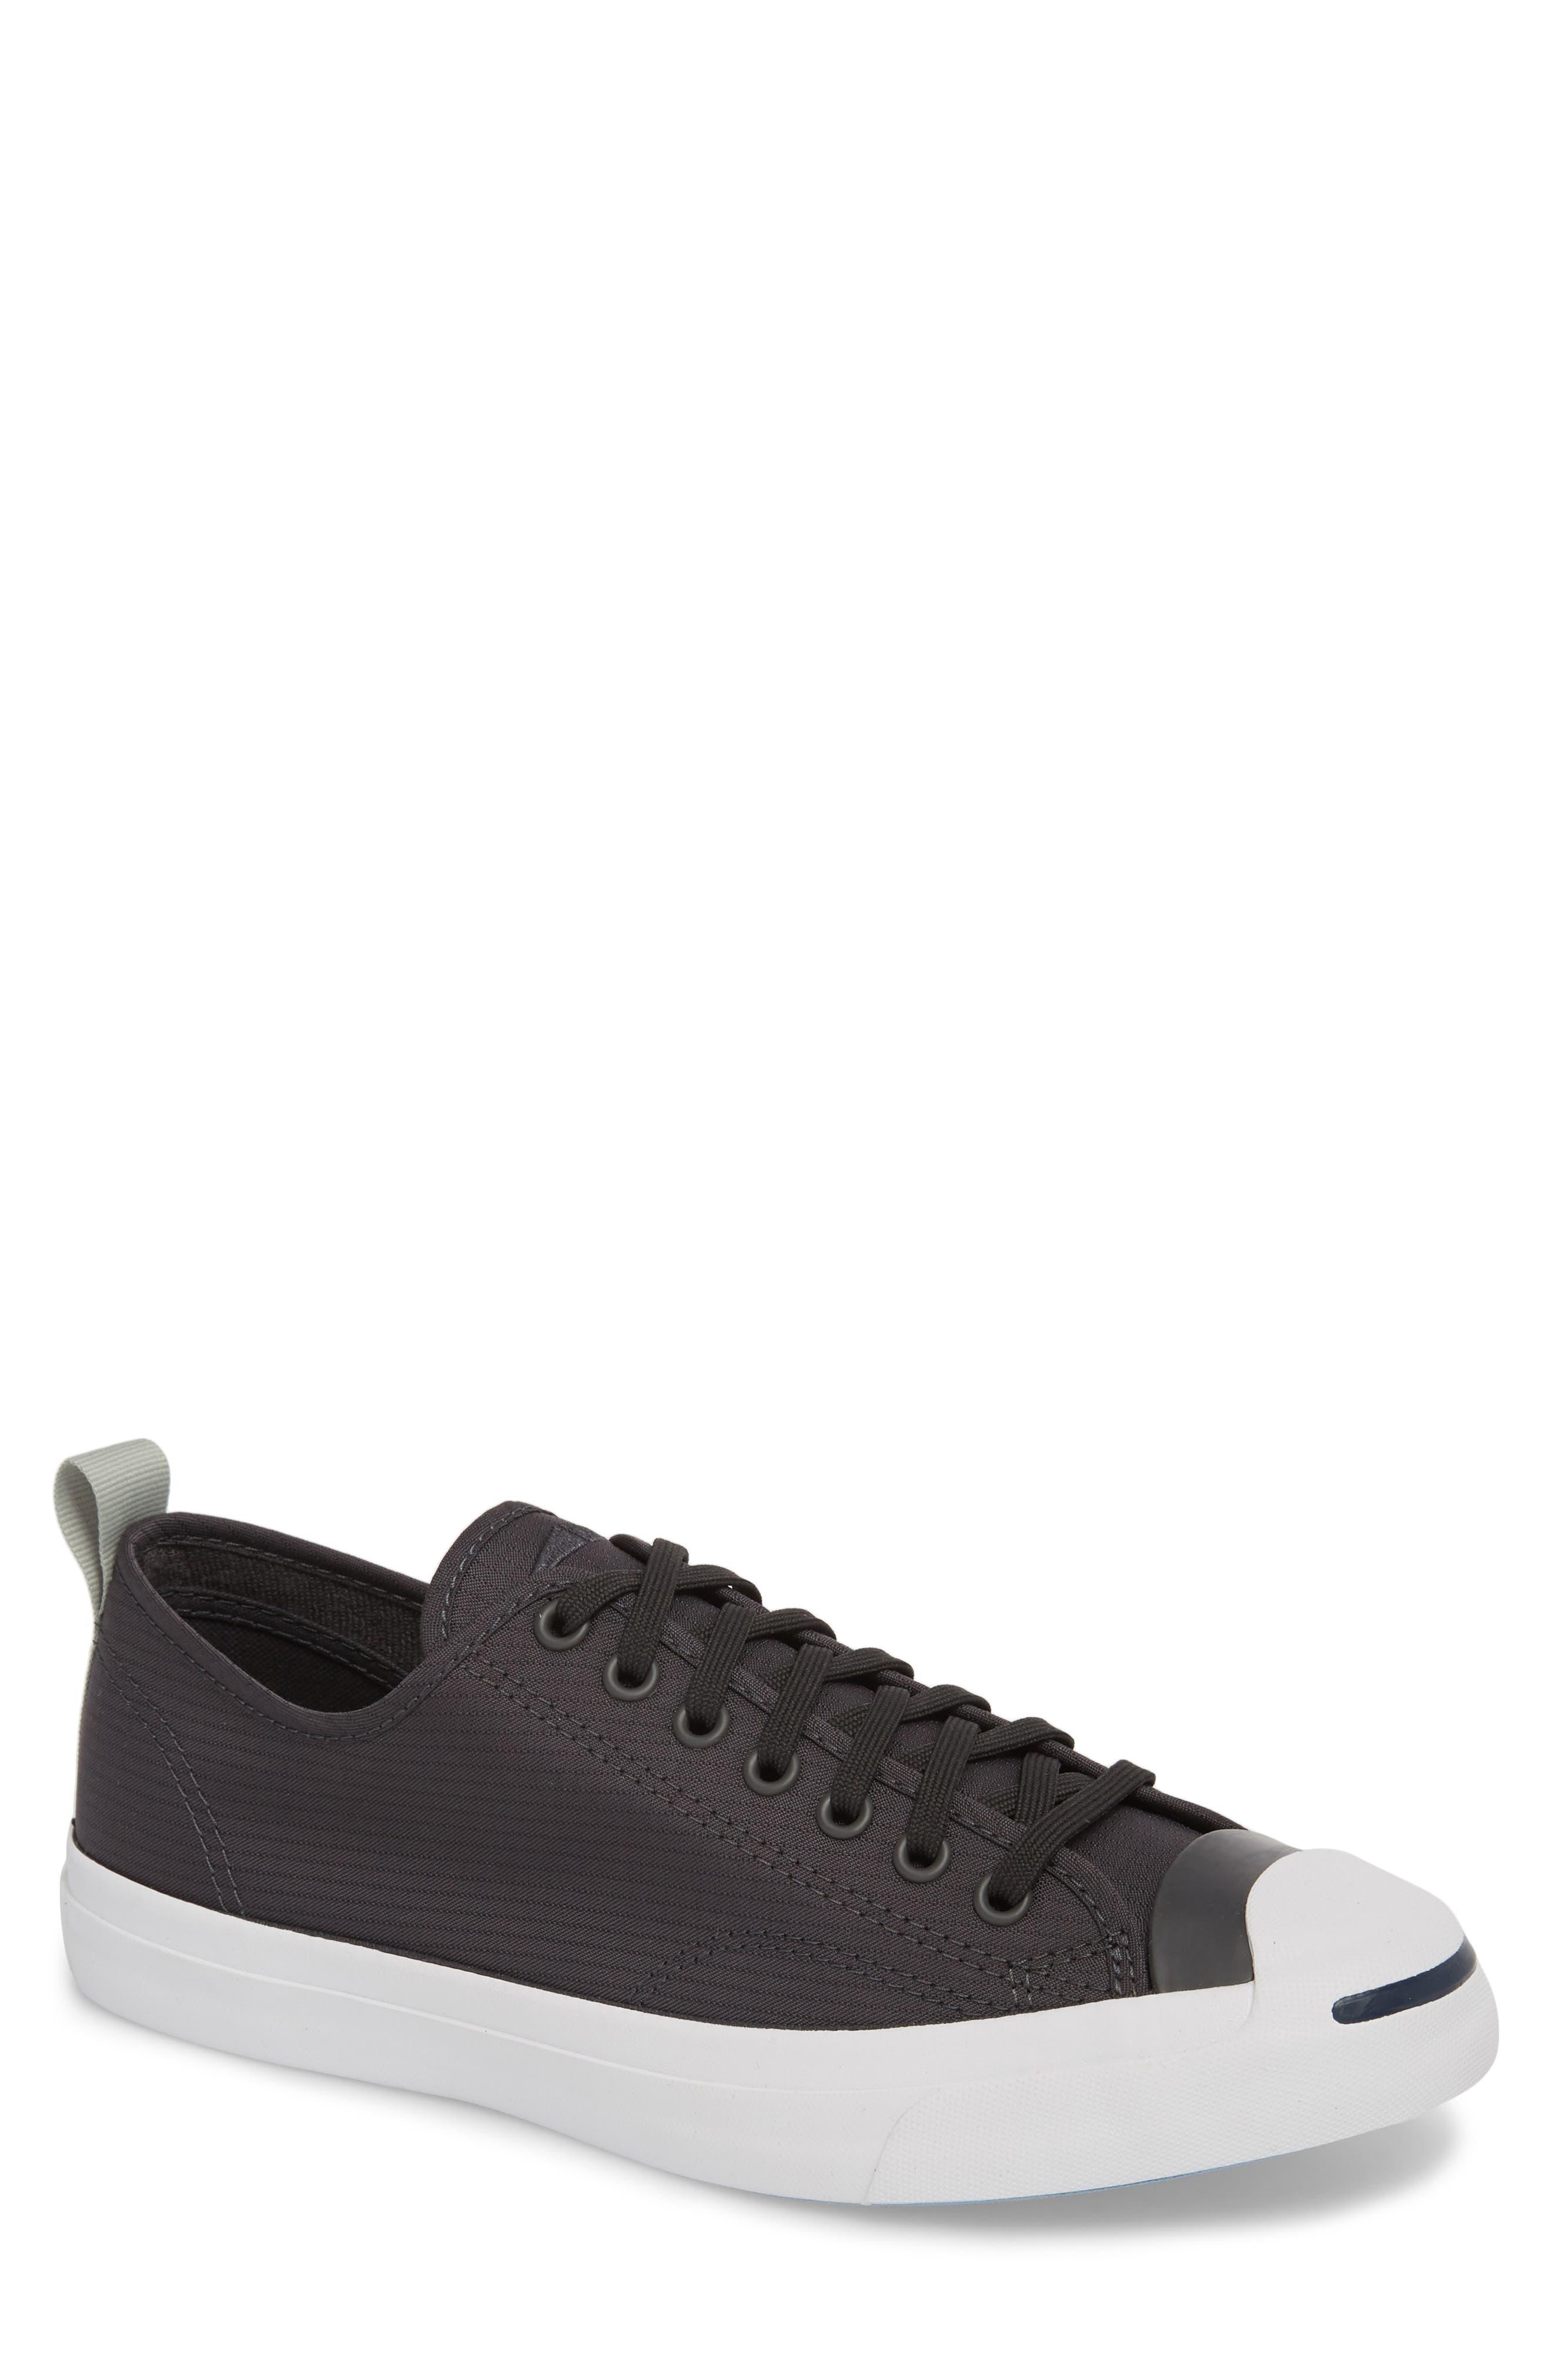 Converse Jack Purcell Ripstop Sneaker (Men)